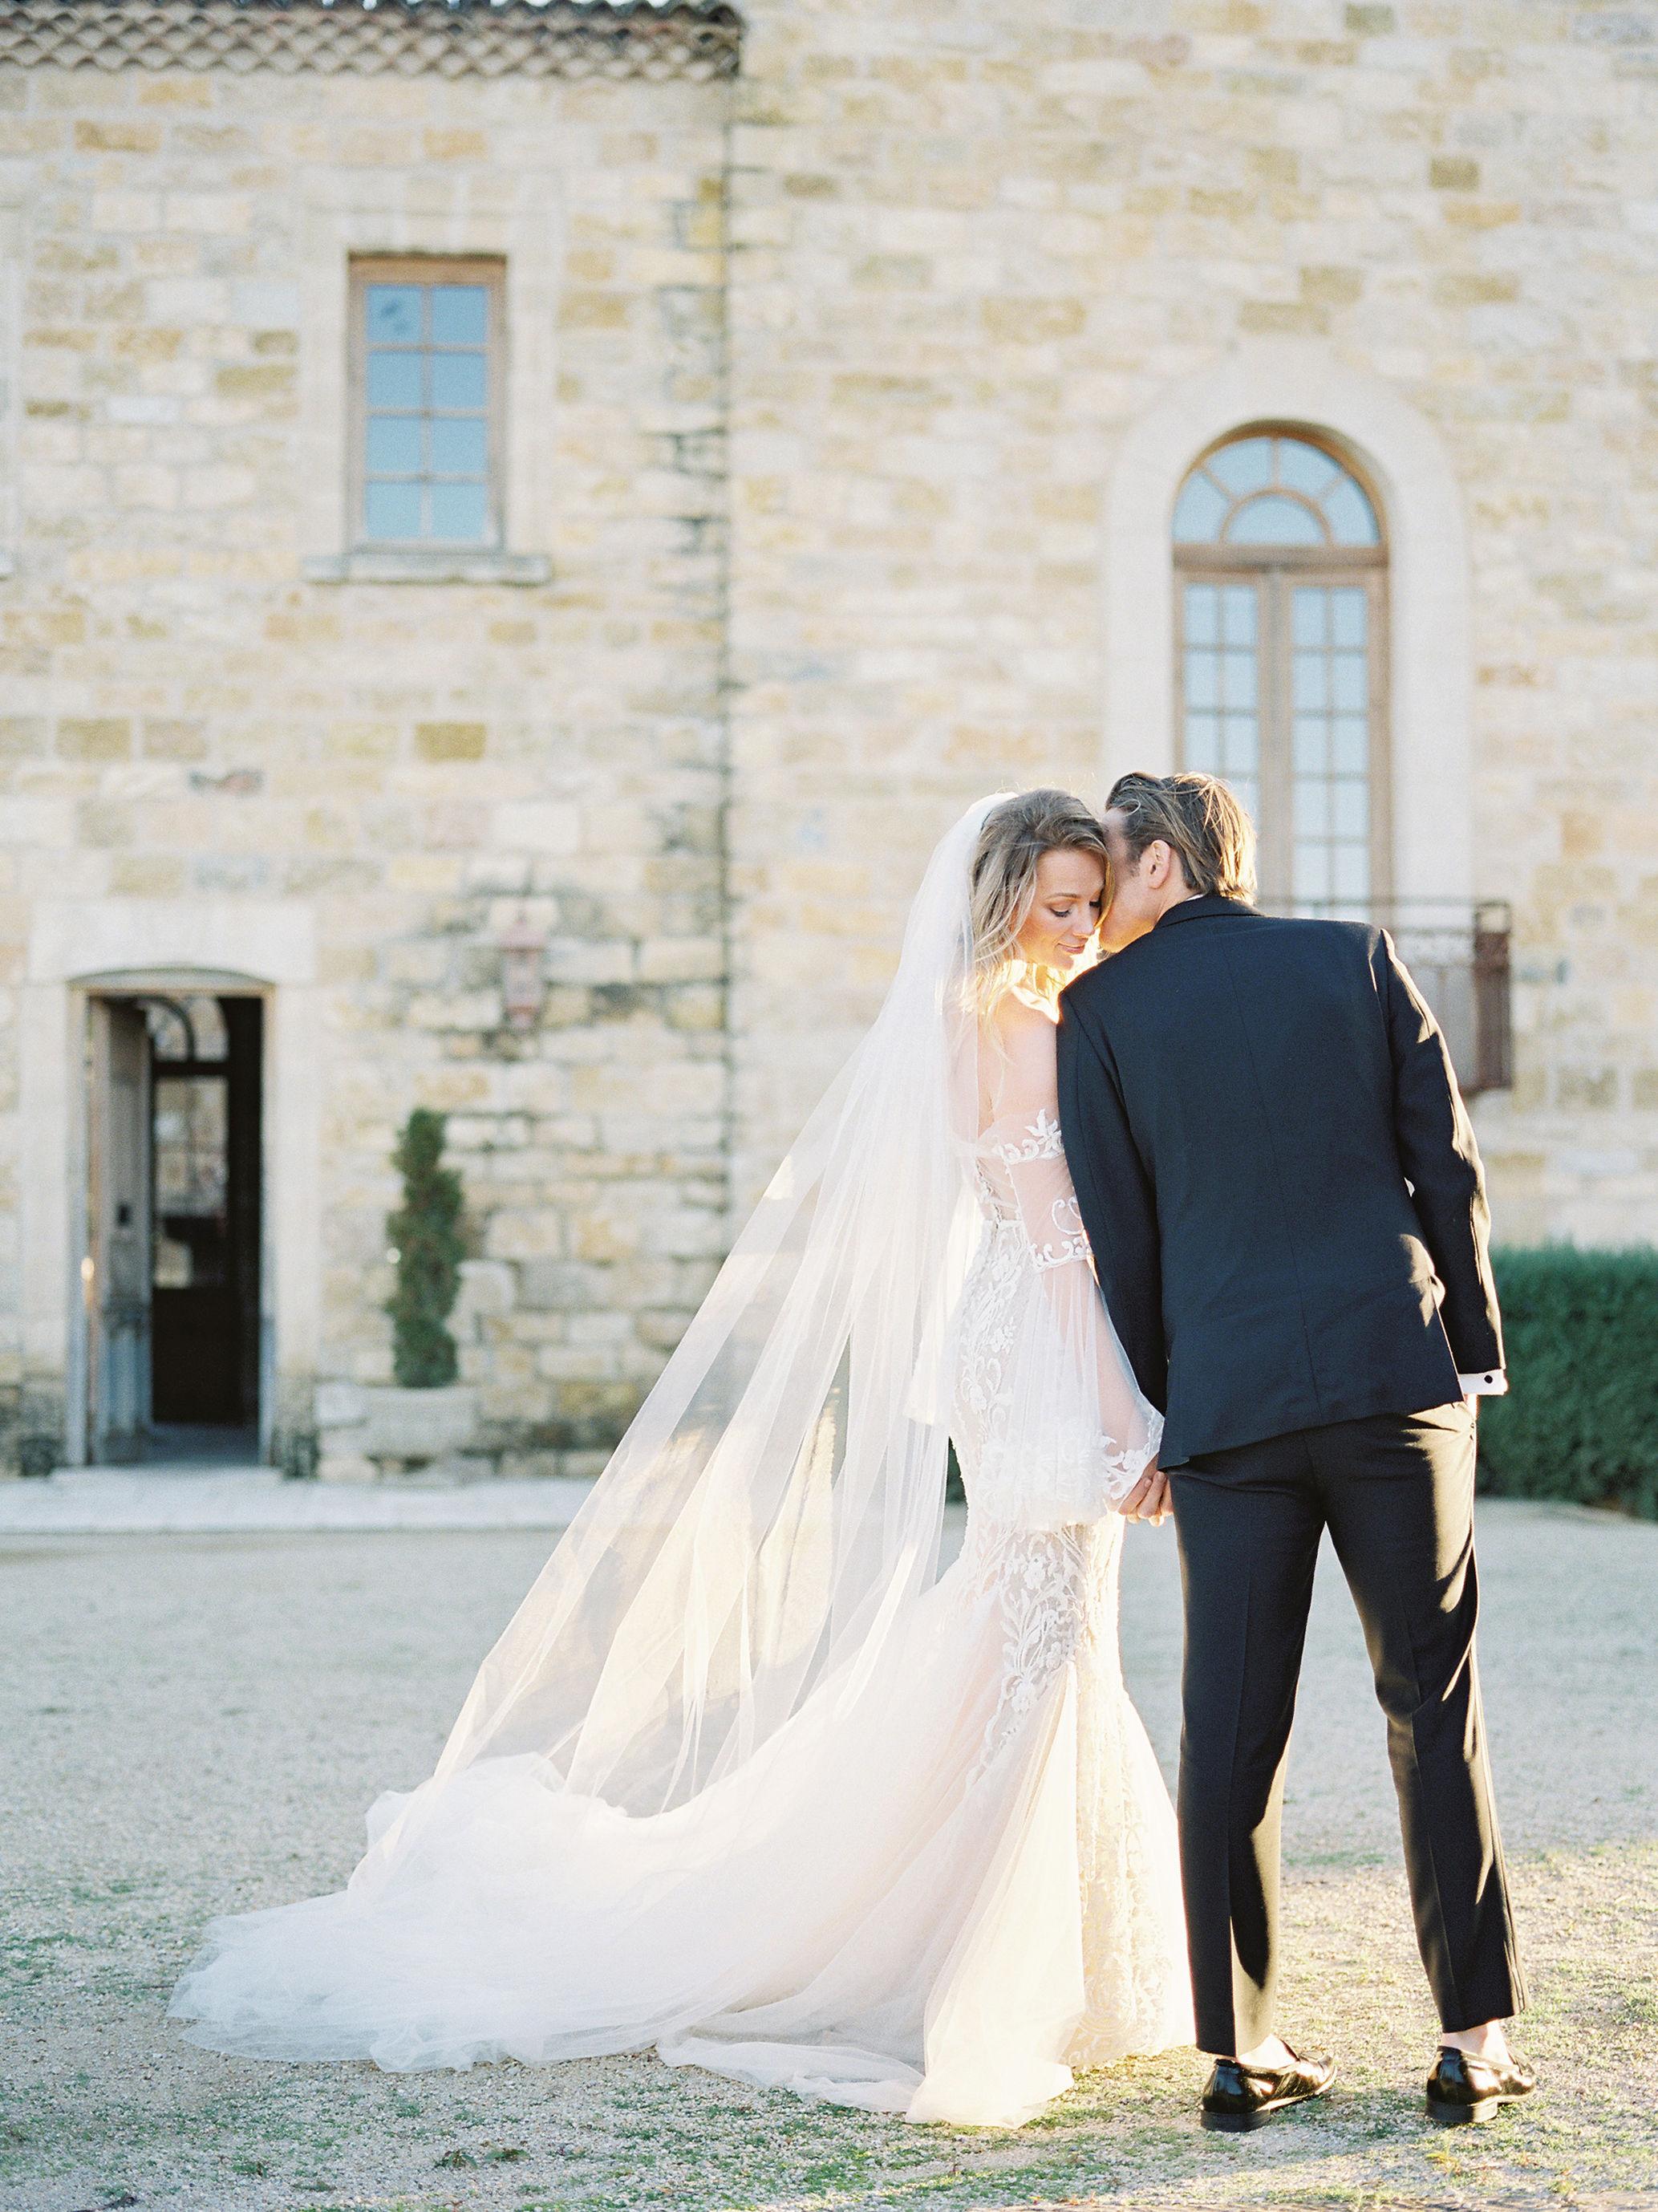 jessica-zimmerman-events-sunstone-bridal-lace-gown-wedding.jpg